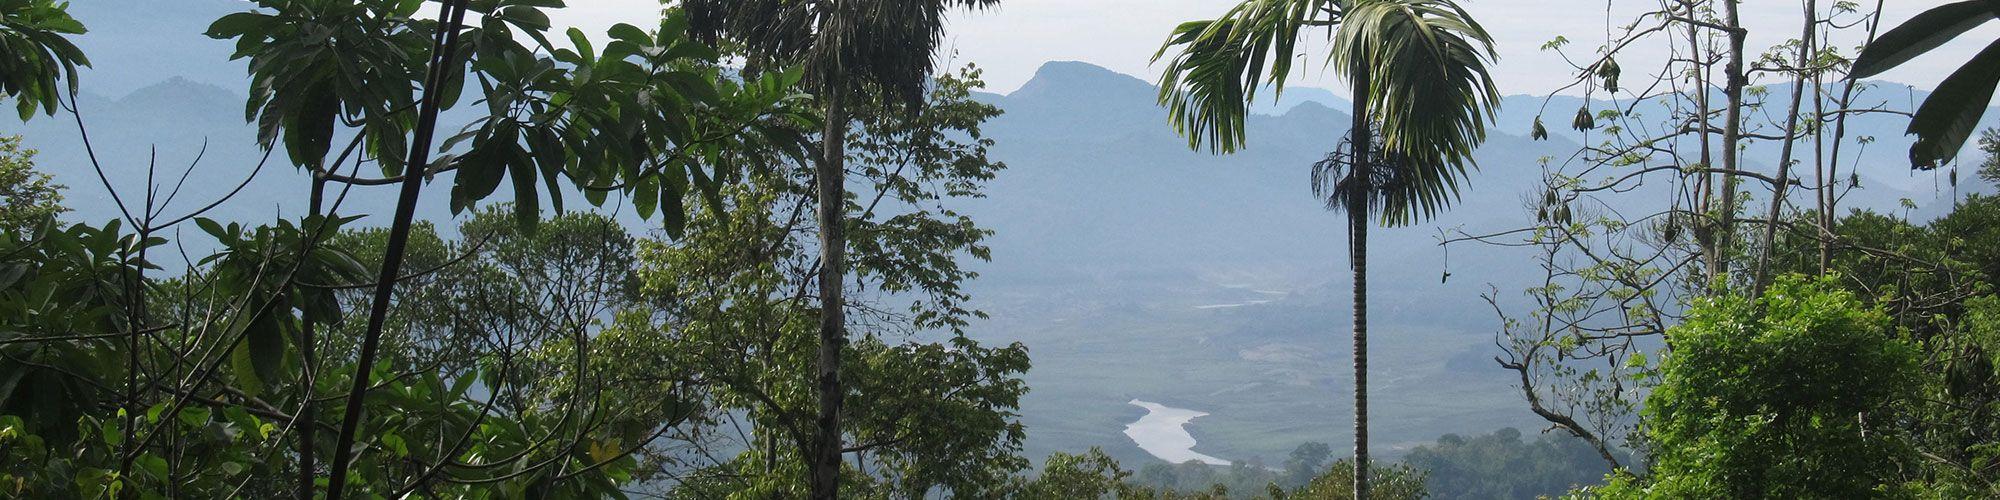 Sri Lanka, Hill Country, View